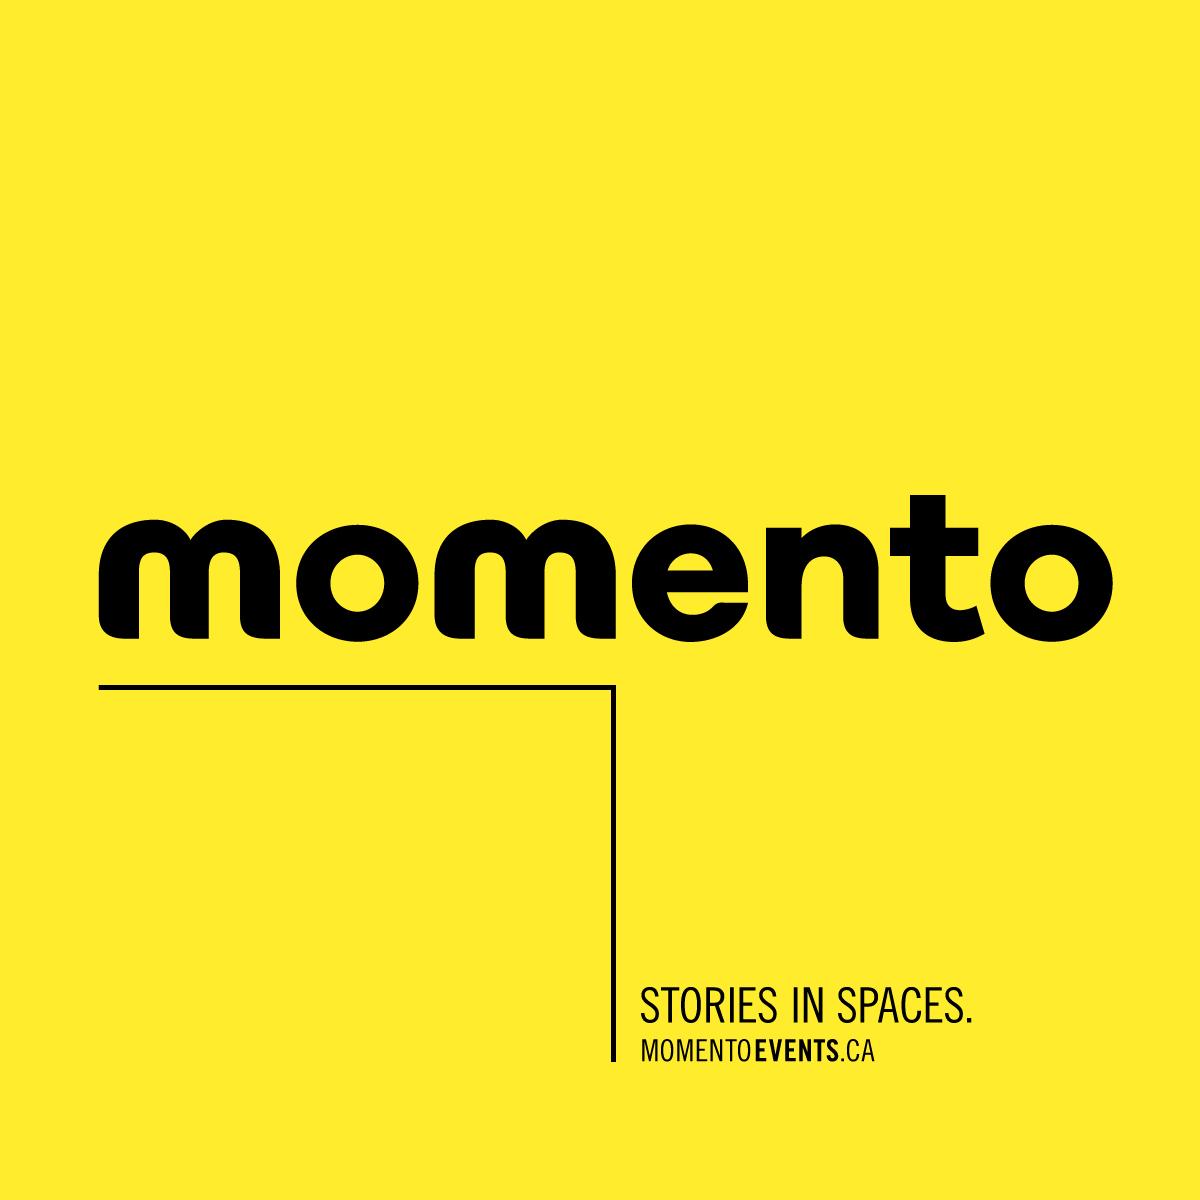 Momento-Logo-Yellow